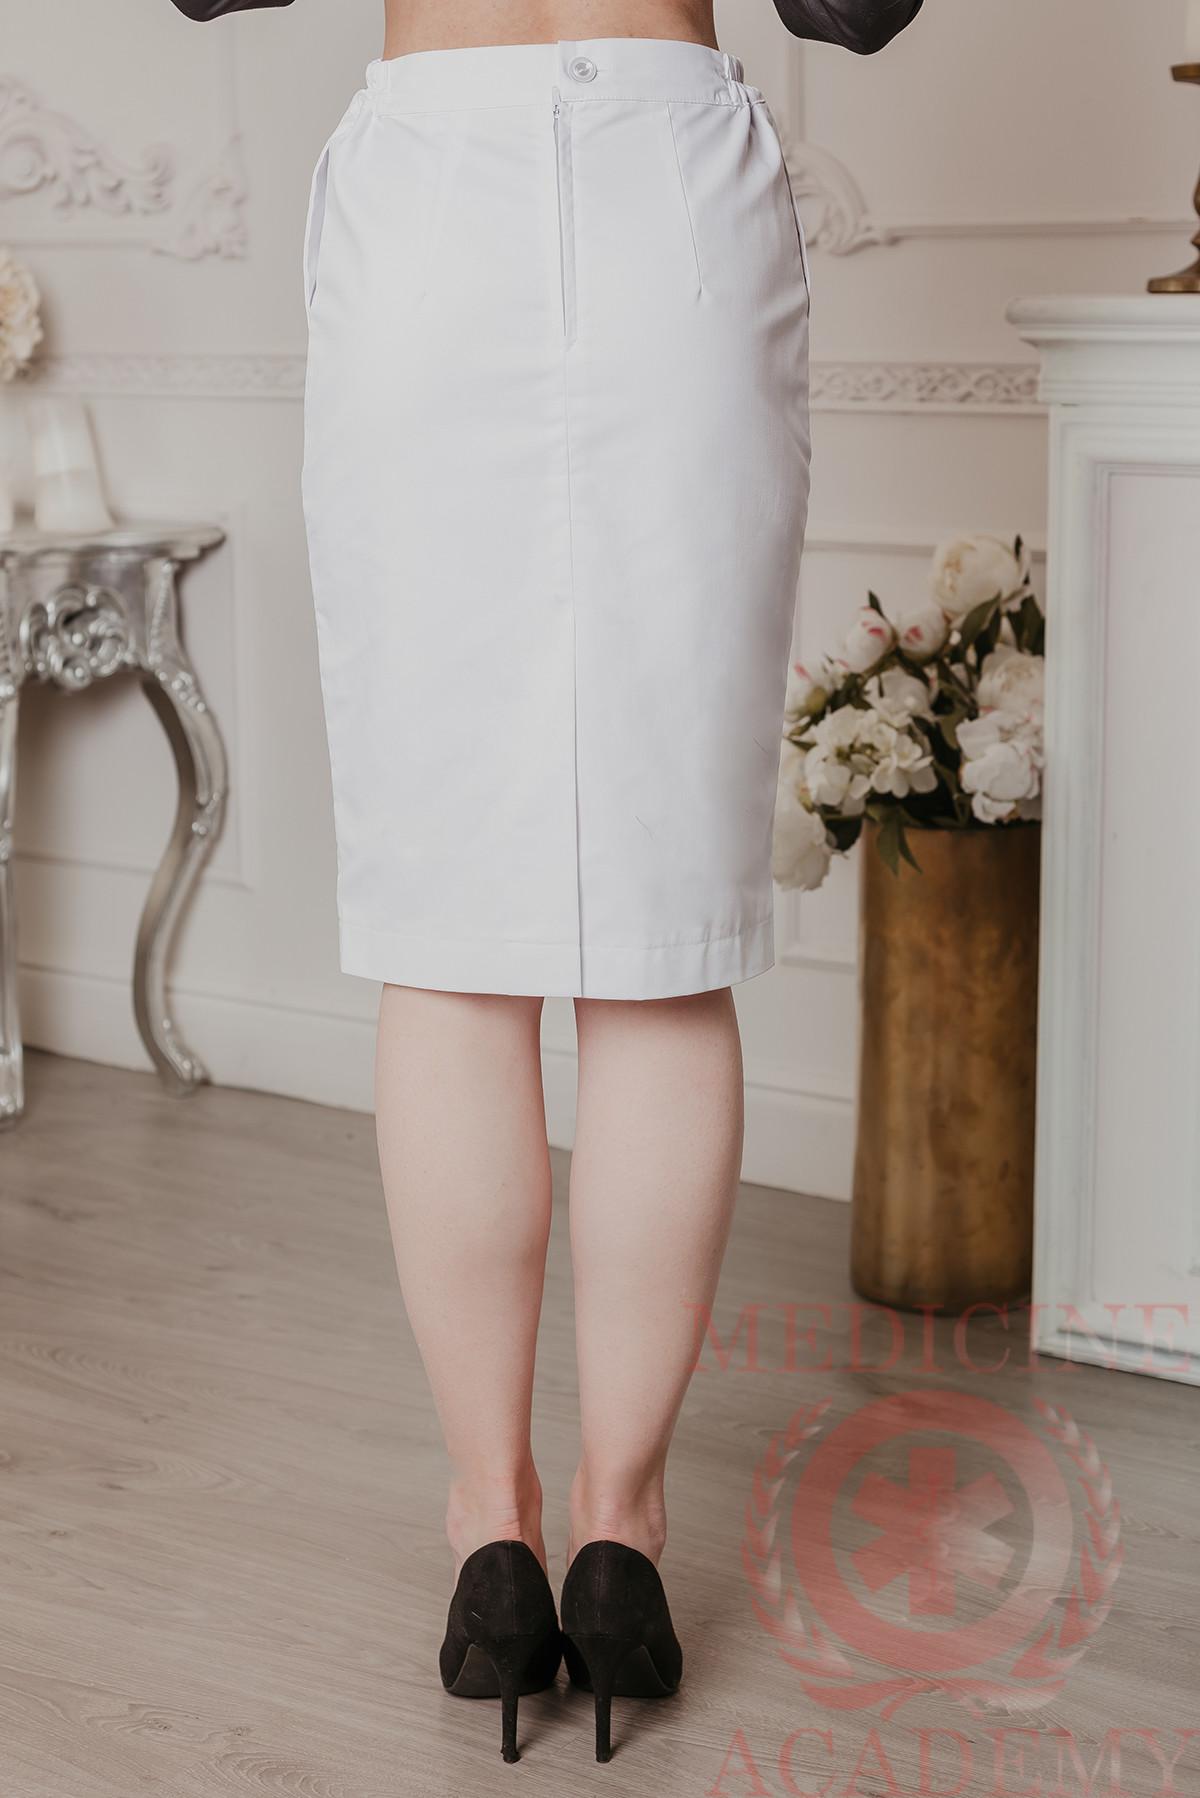 Медицинская юбка на подкладе белая